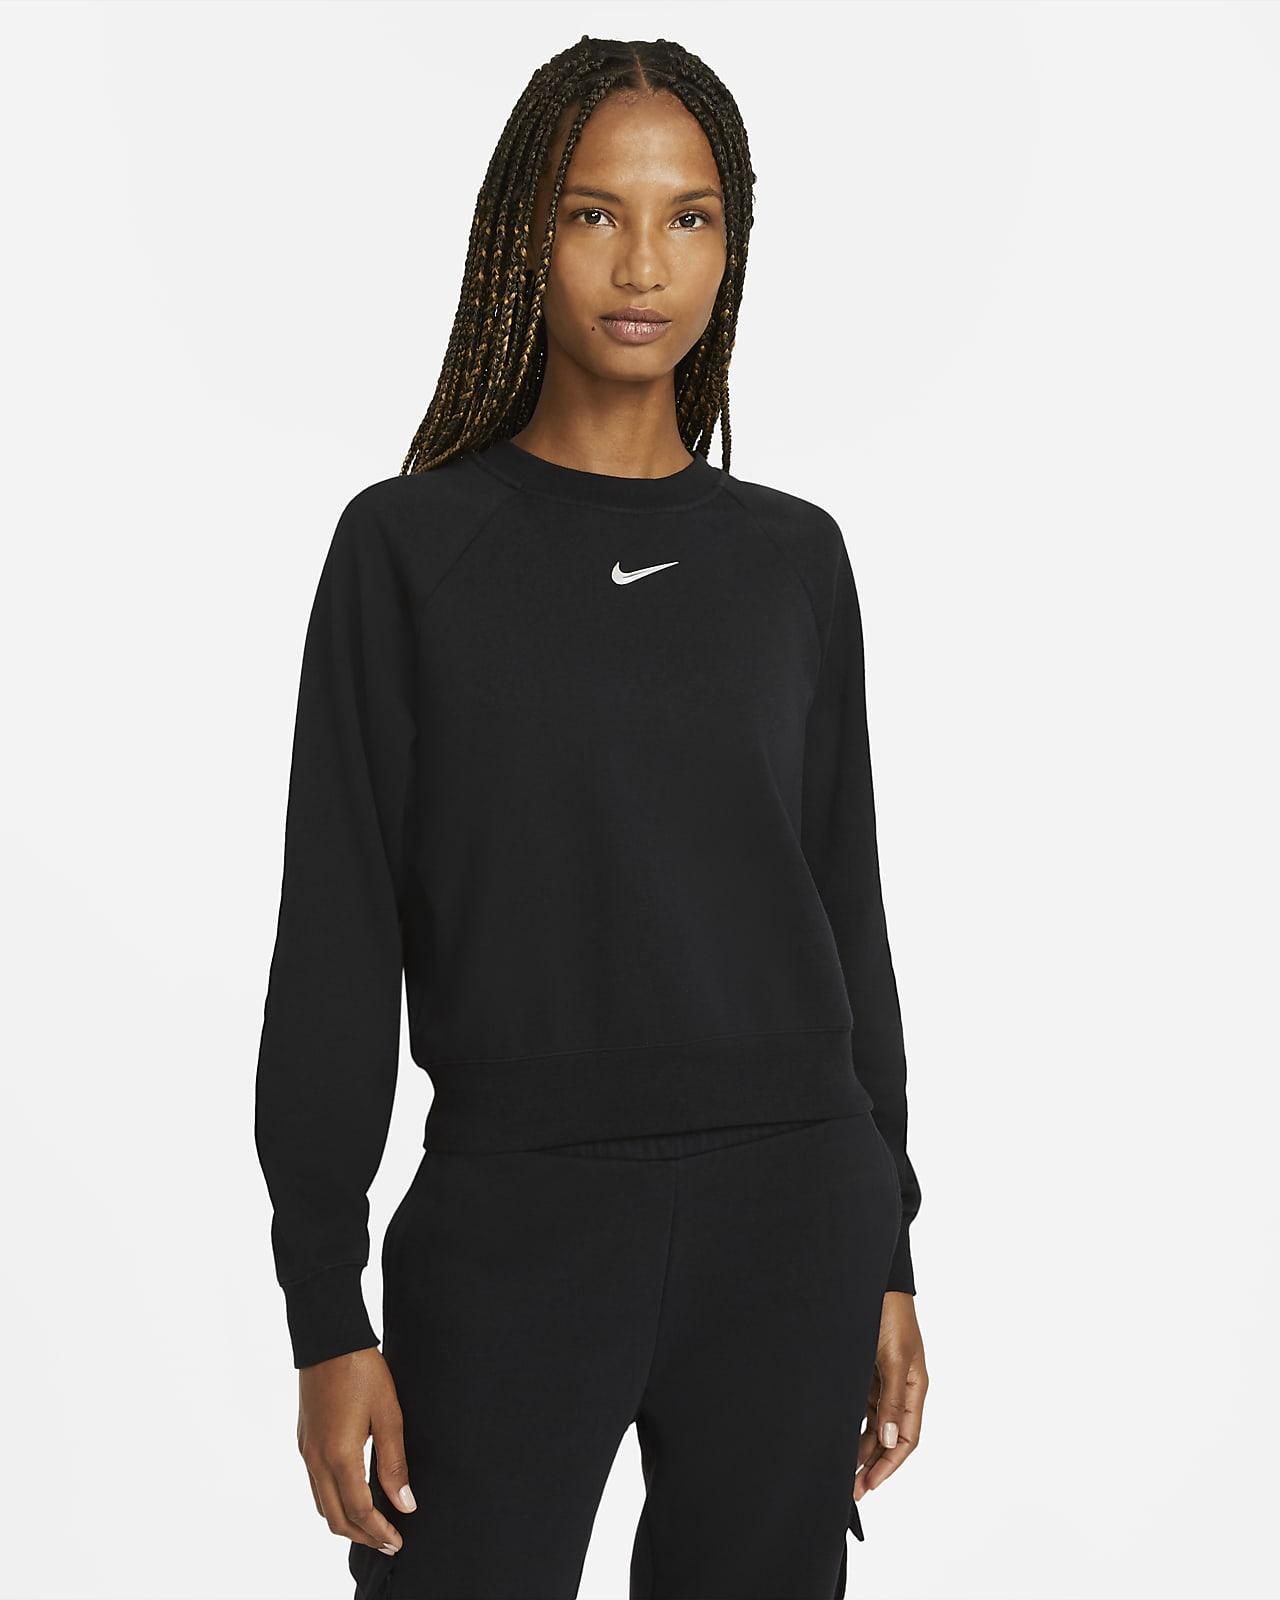 Nike Sportswear Swoosh Women's French Terry Crew